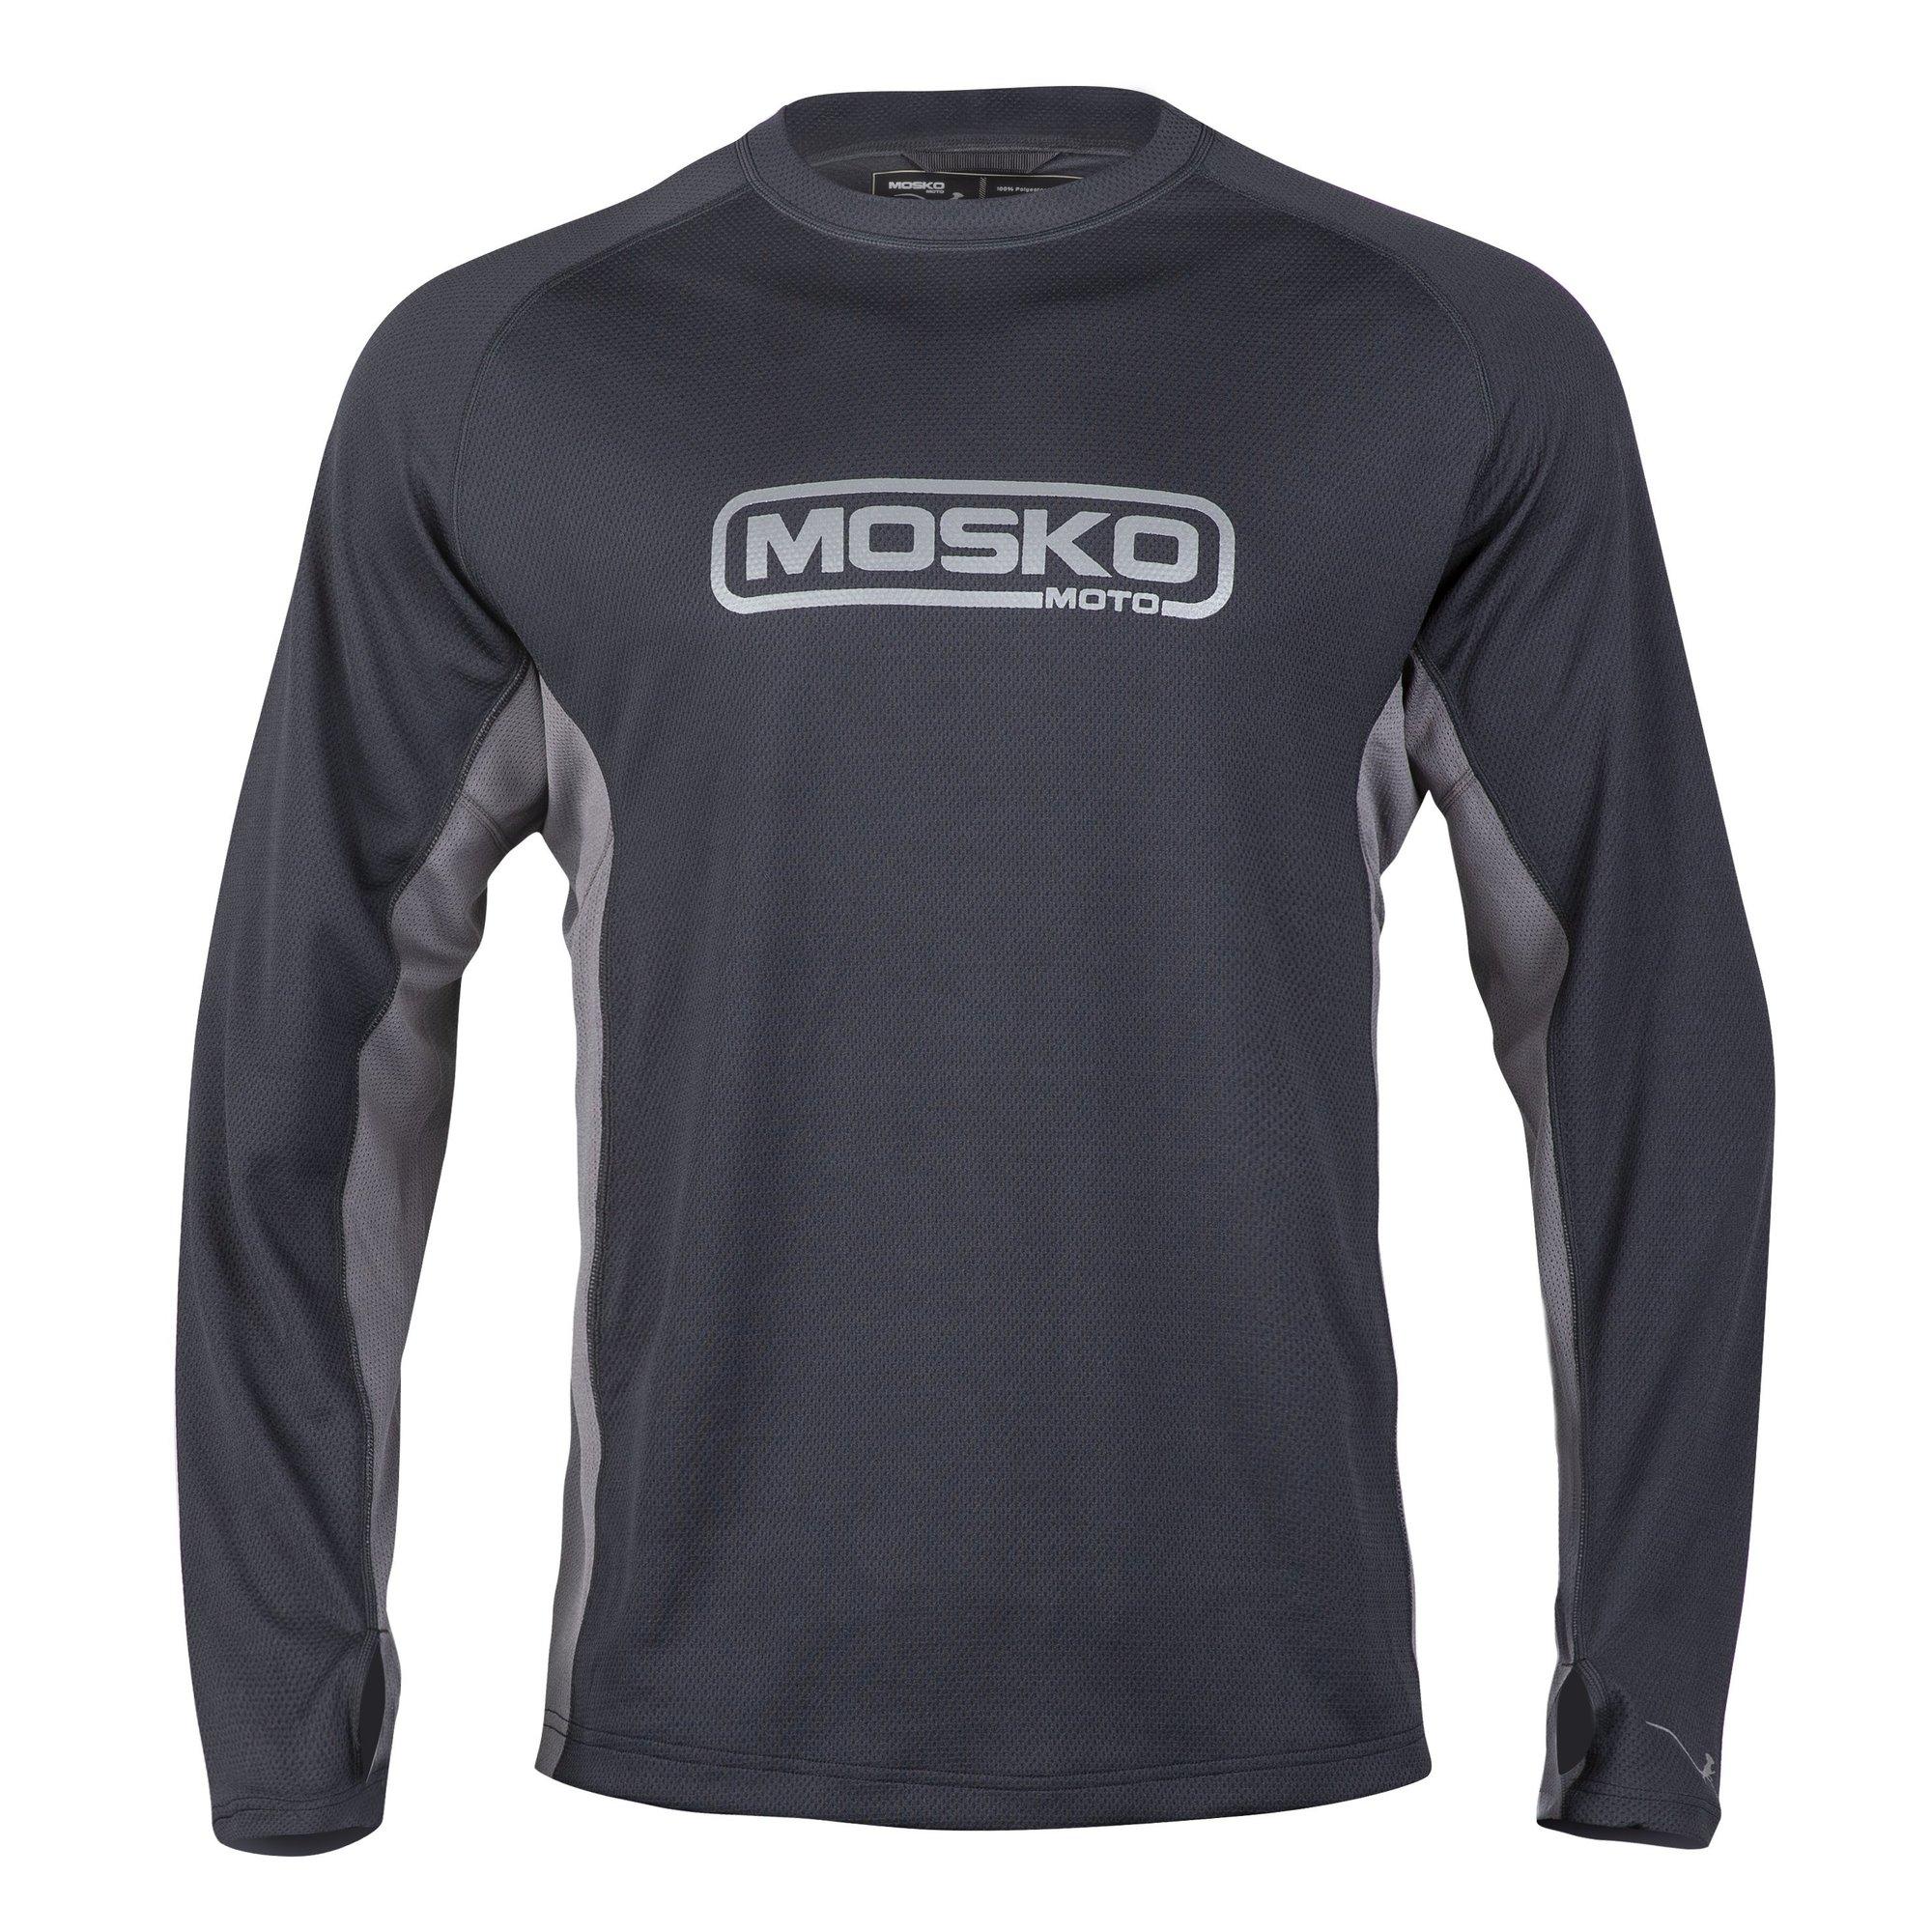 mosko-moto-apparel-signal-jersey-11333240193085_2000x.jpg